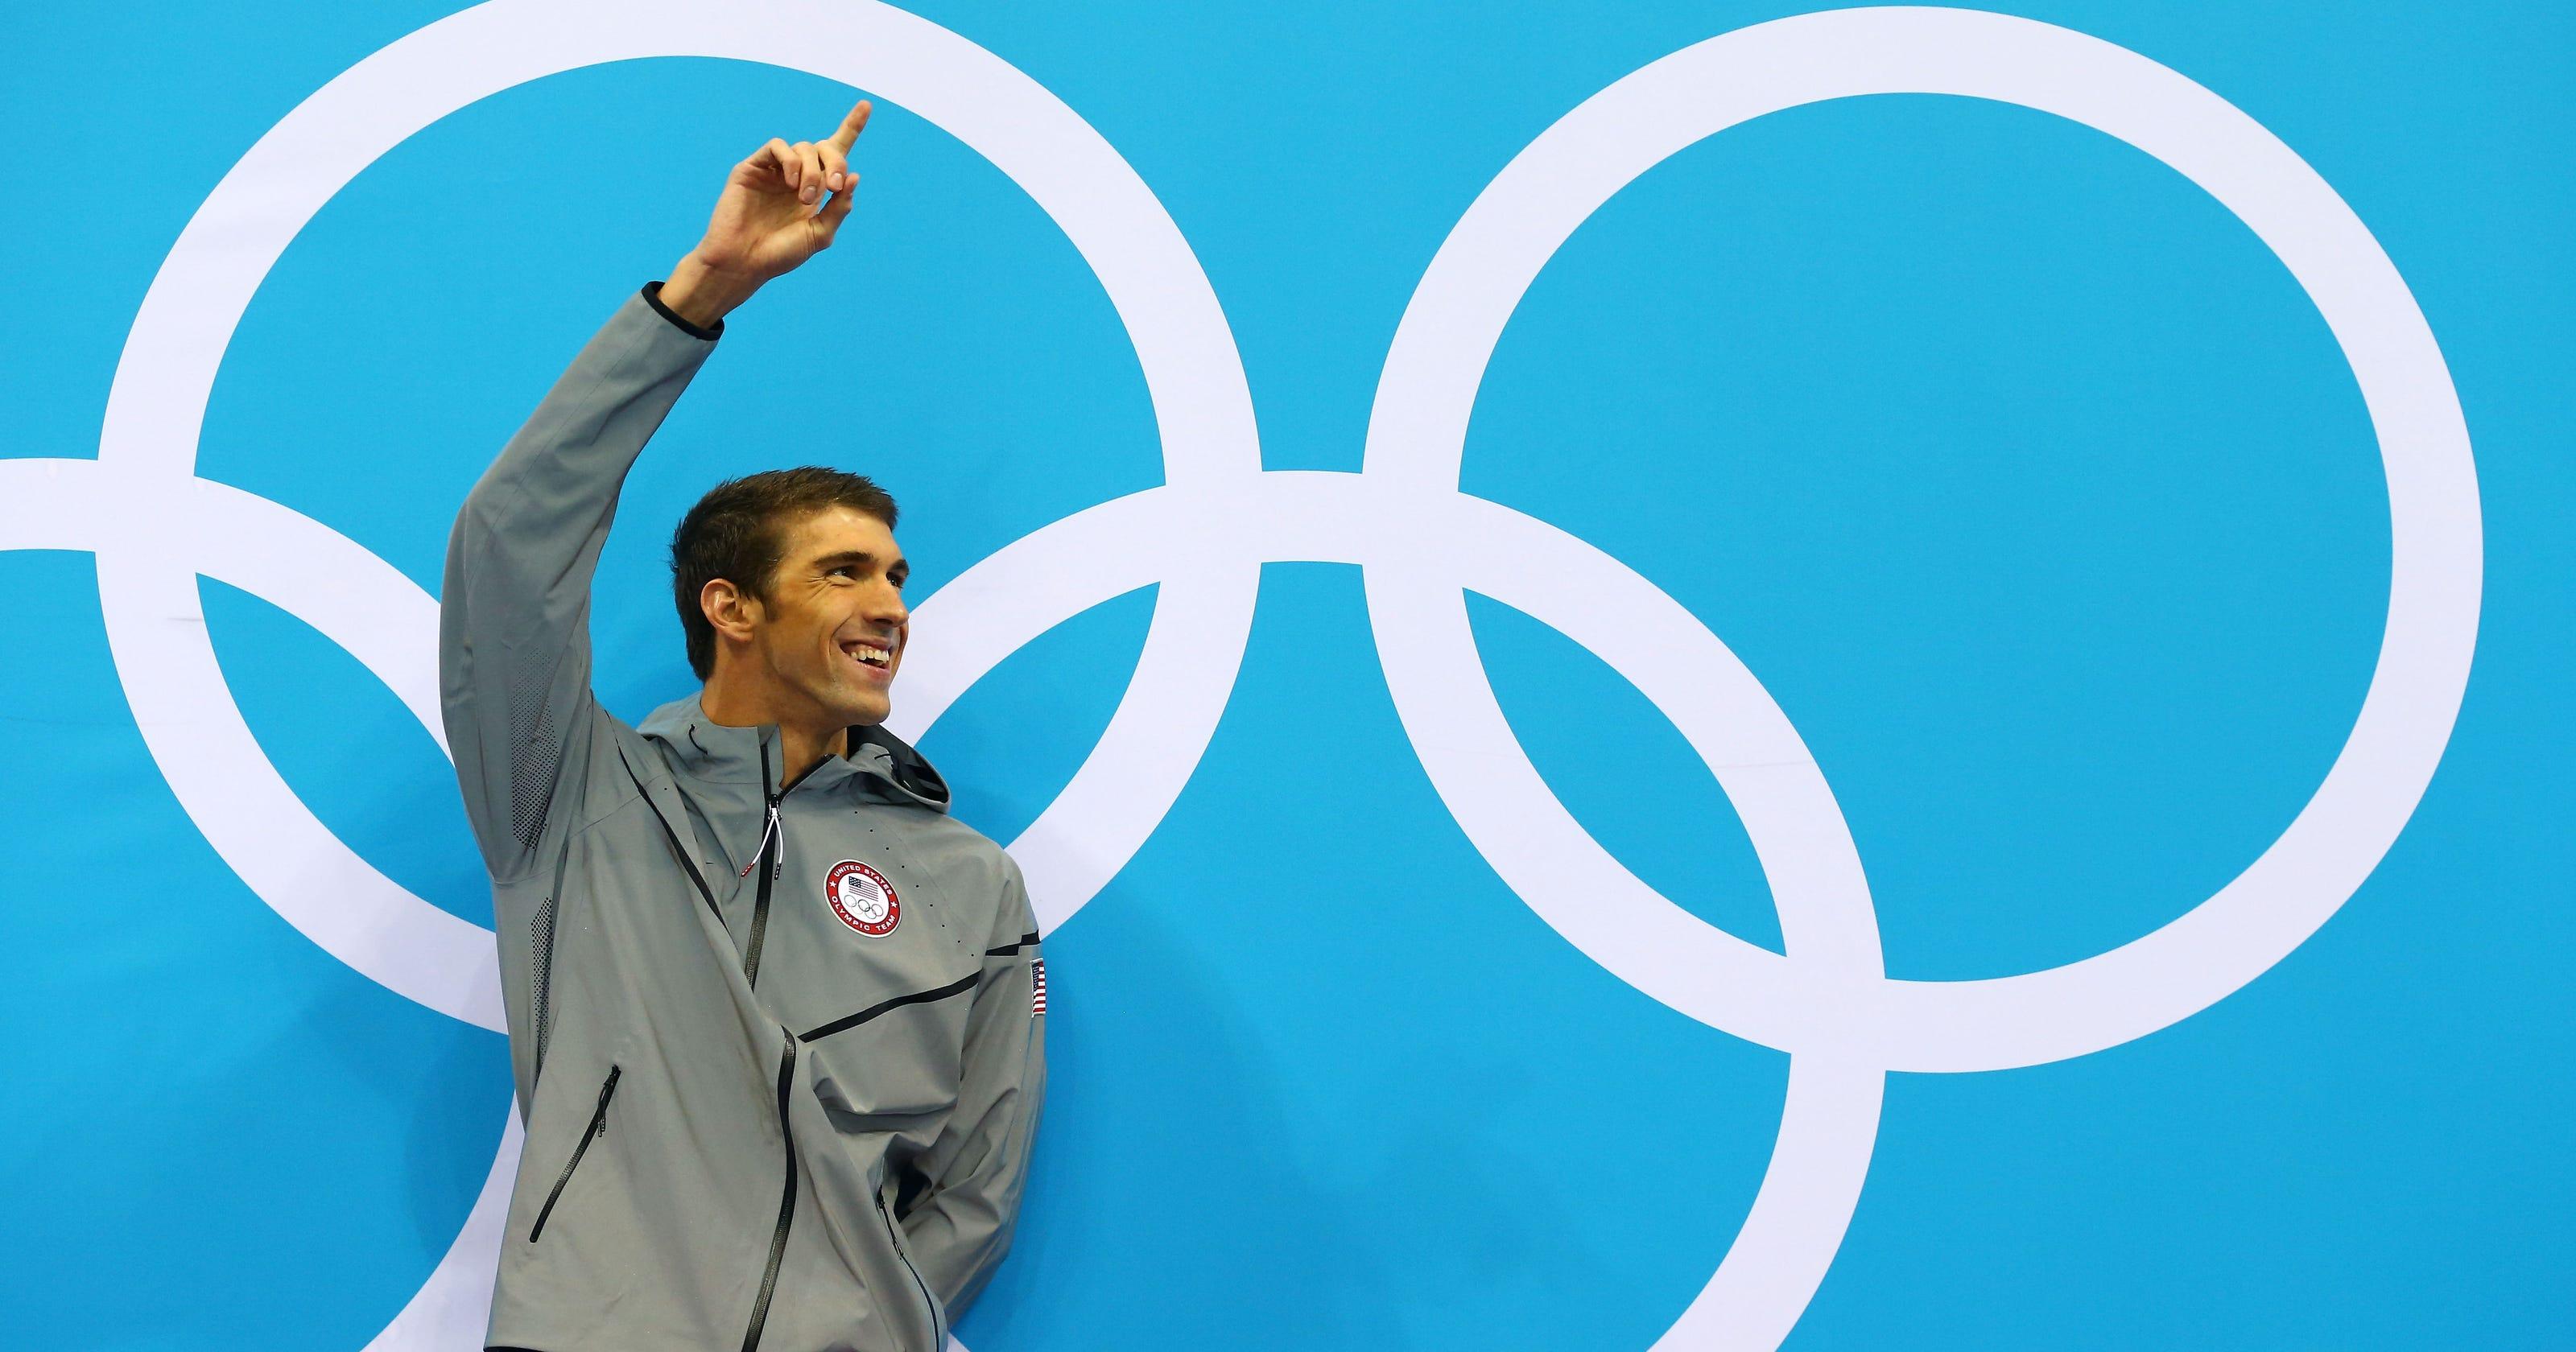 06266bfae93b4 Olympic great Michael Phelps ending retirement